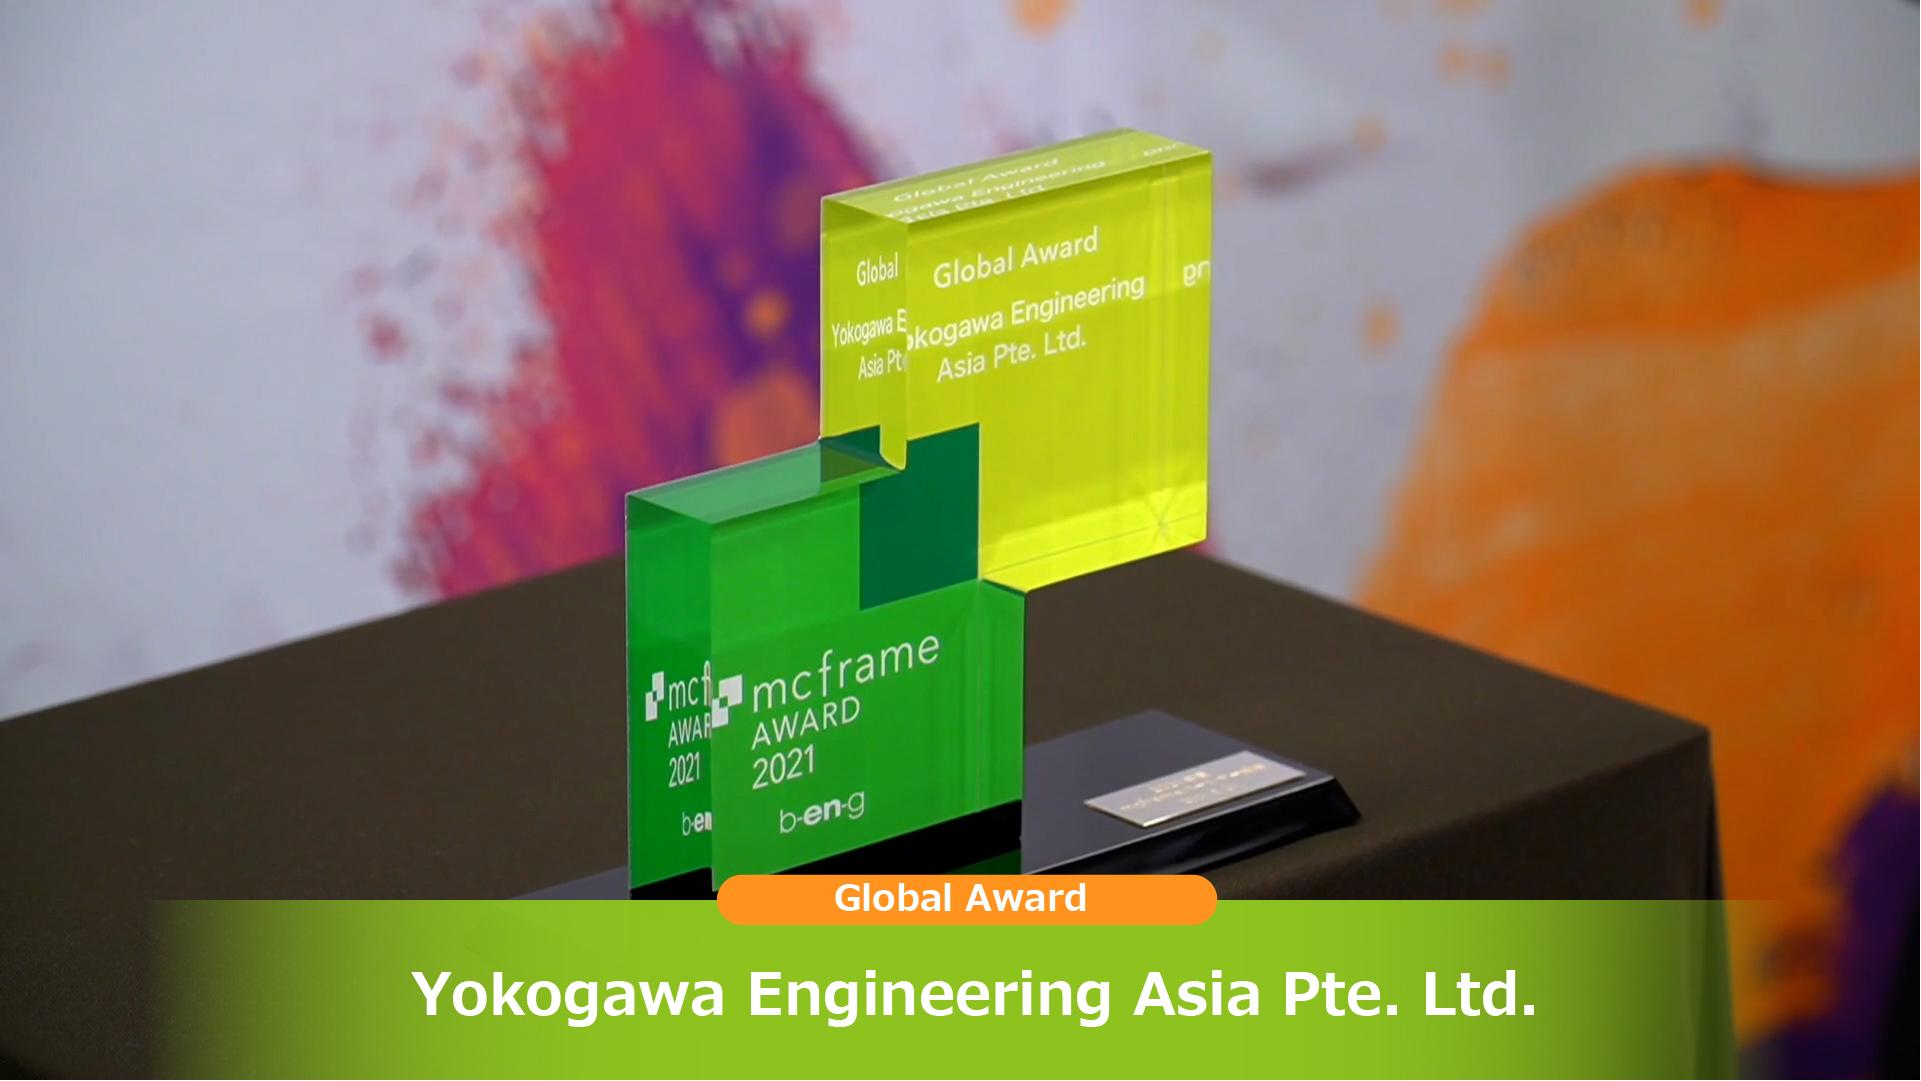 Yokogawa Engineering Asia Pte. Ltd.